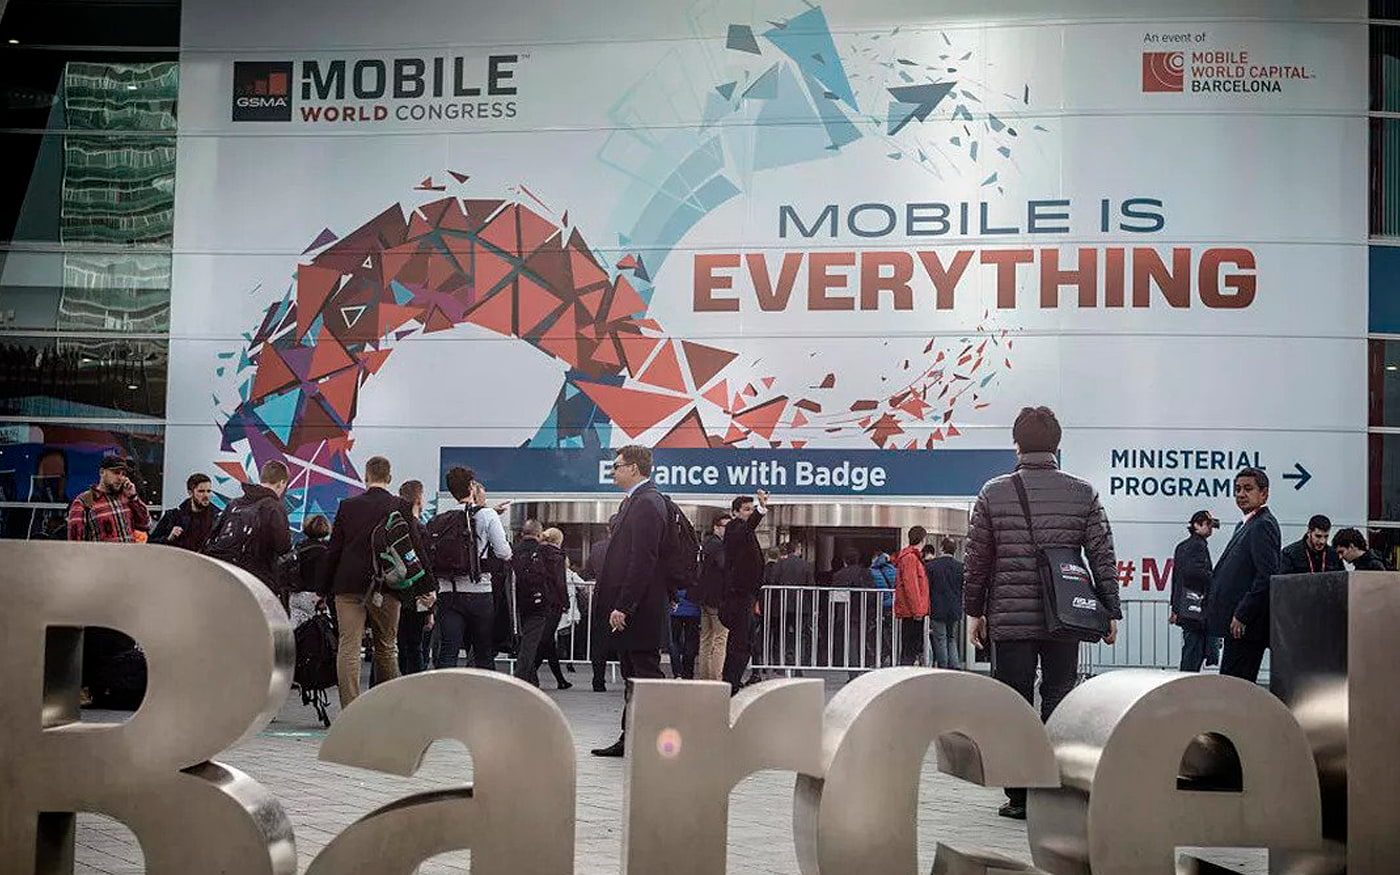 Mobile World Congress 2020 cancelada: Coronavírus interrompe conferência global de tecnologia